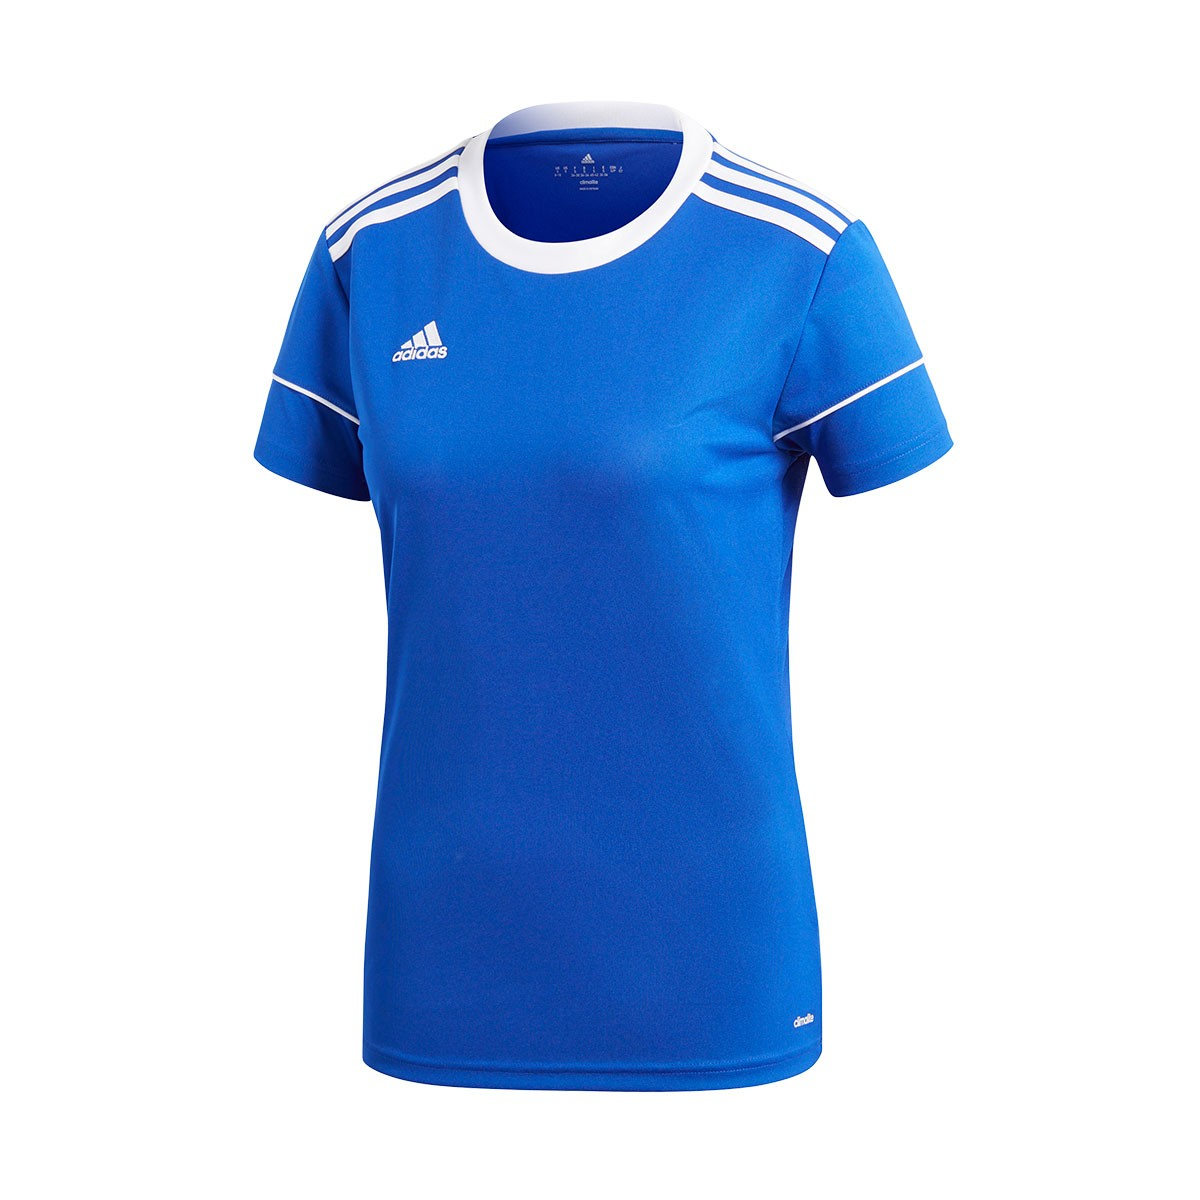 Jersey adidas Woman Squadra 17 m/c Bold blue-White - Fútbol Emotion